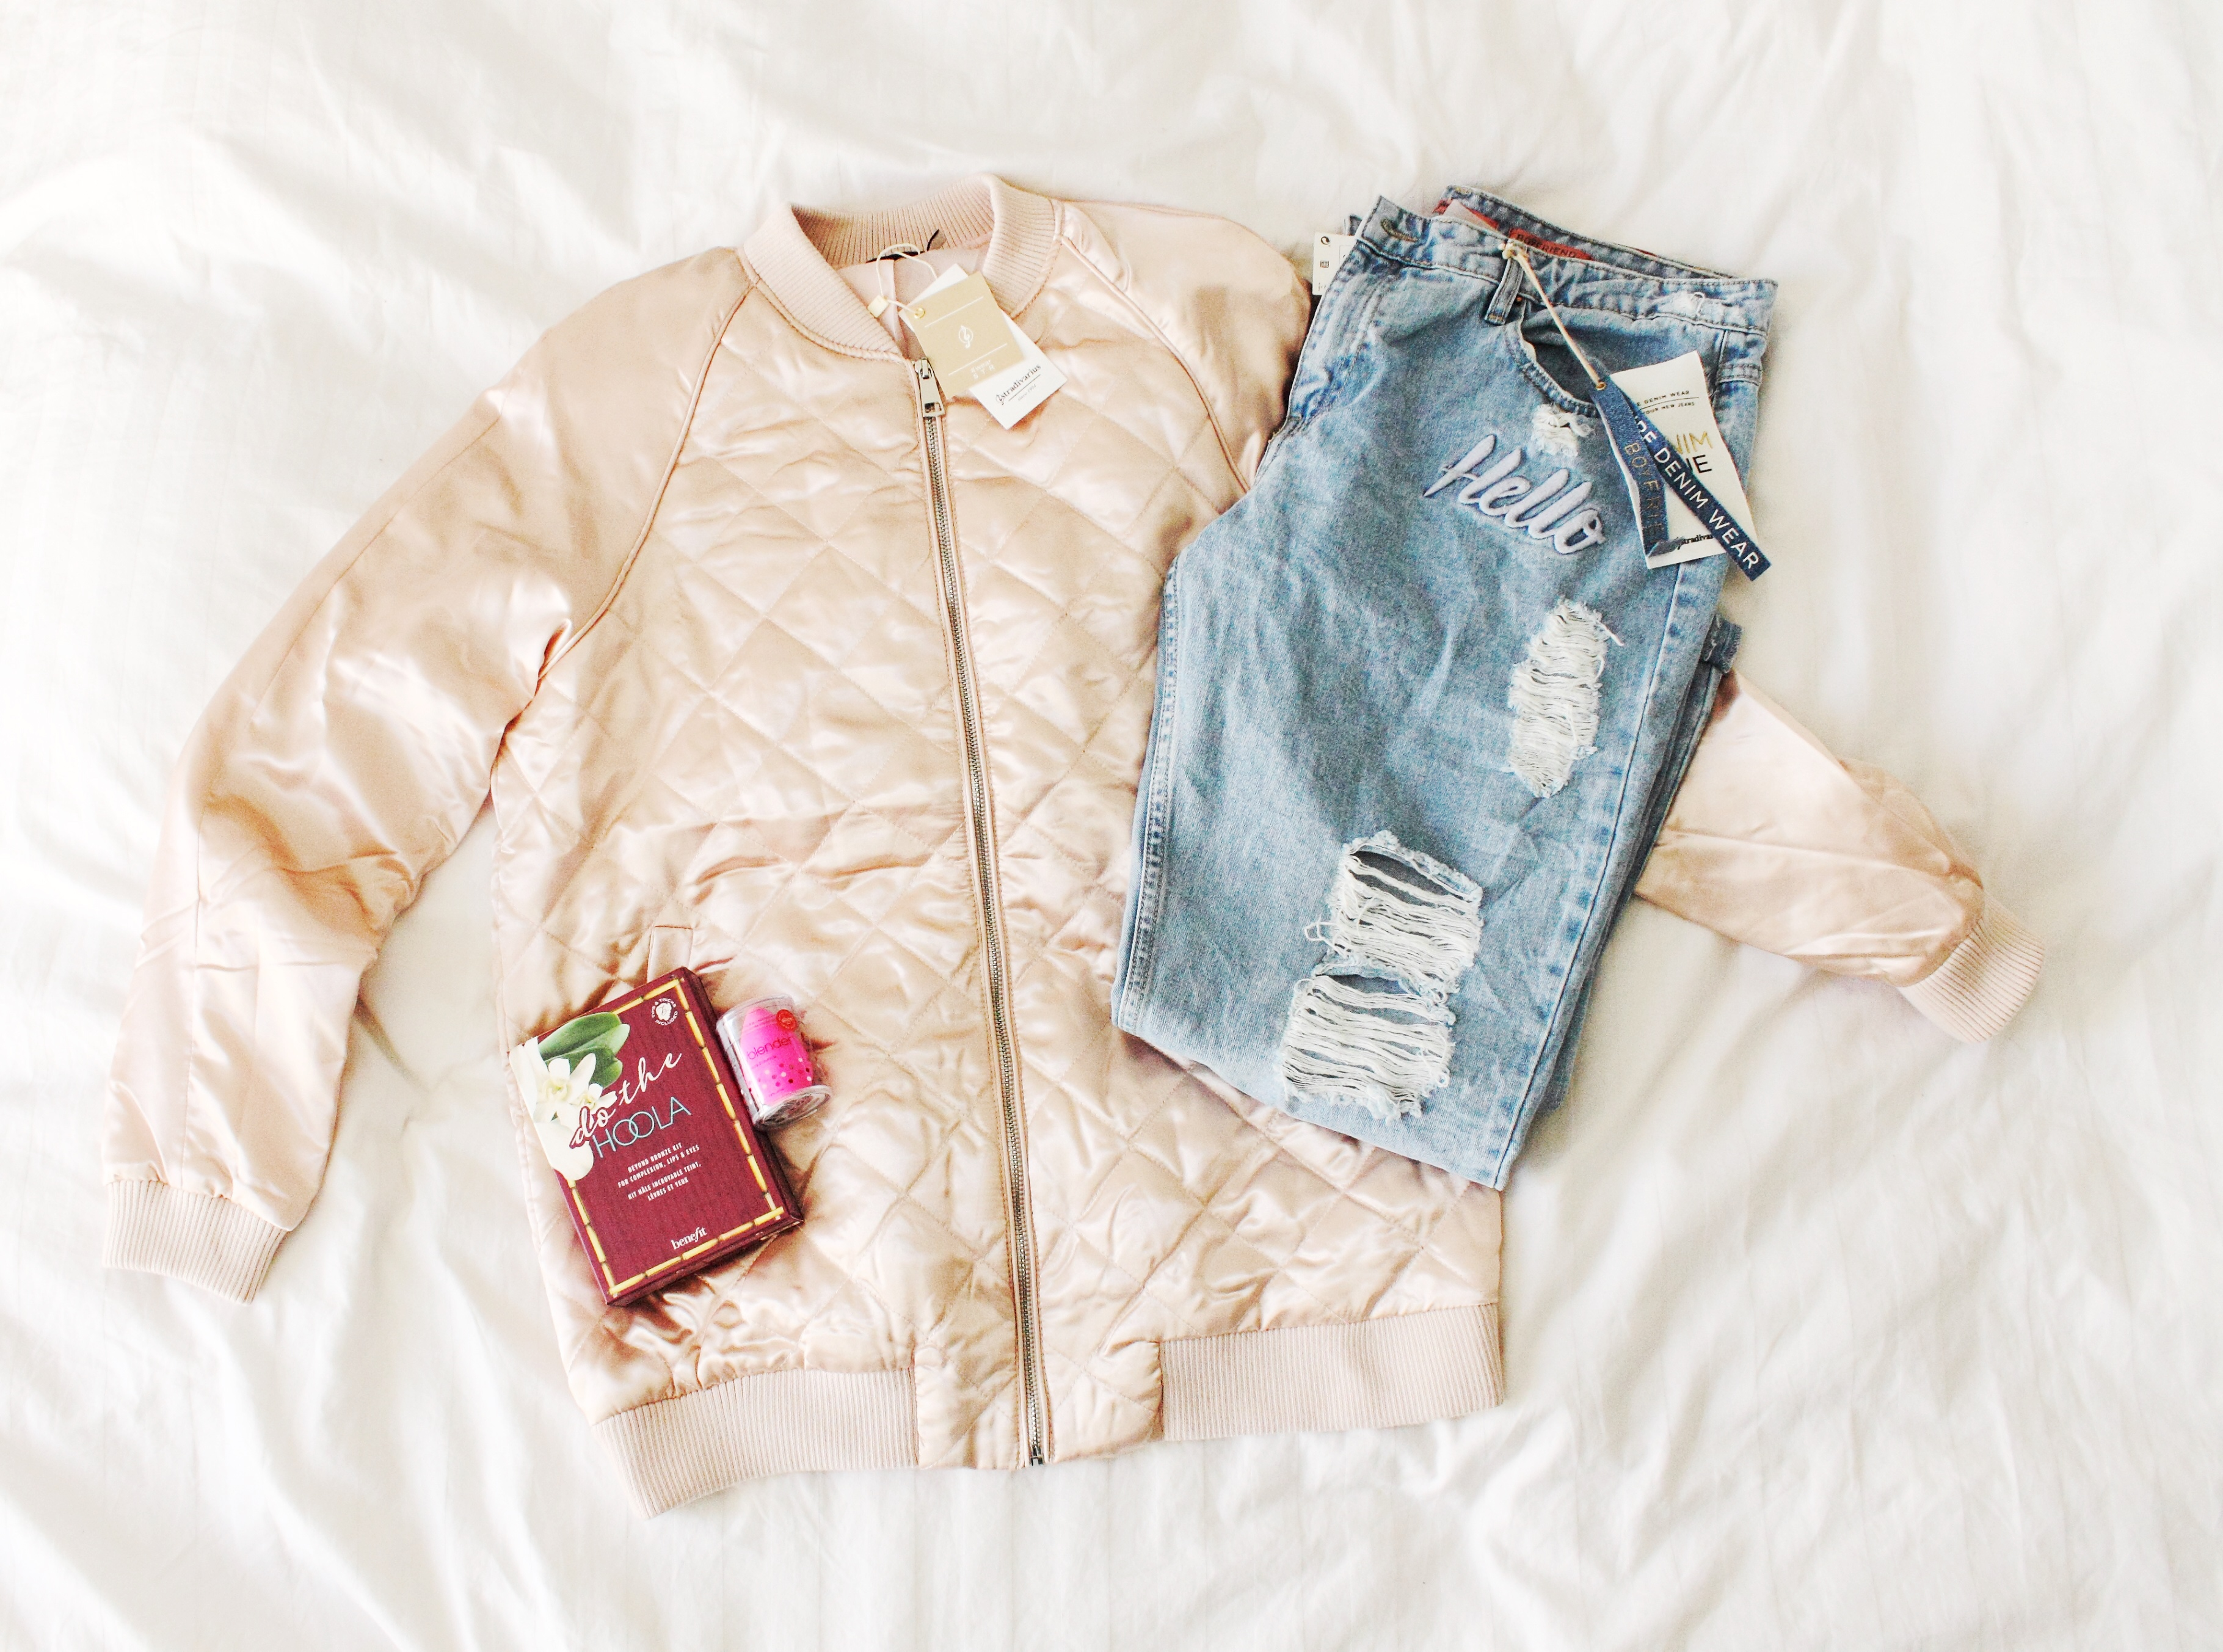 c3aefc5801d pale pink bomber jacket stradivarius ripped denim benefit sephora  beautyblender